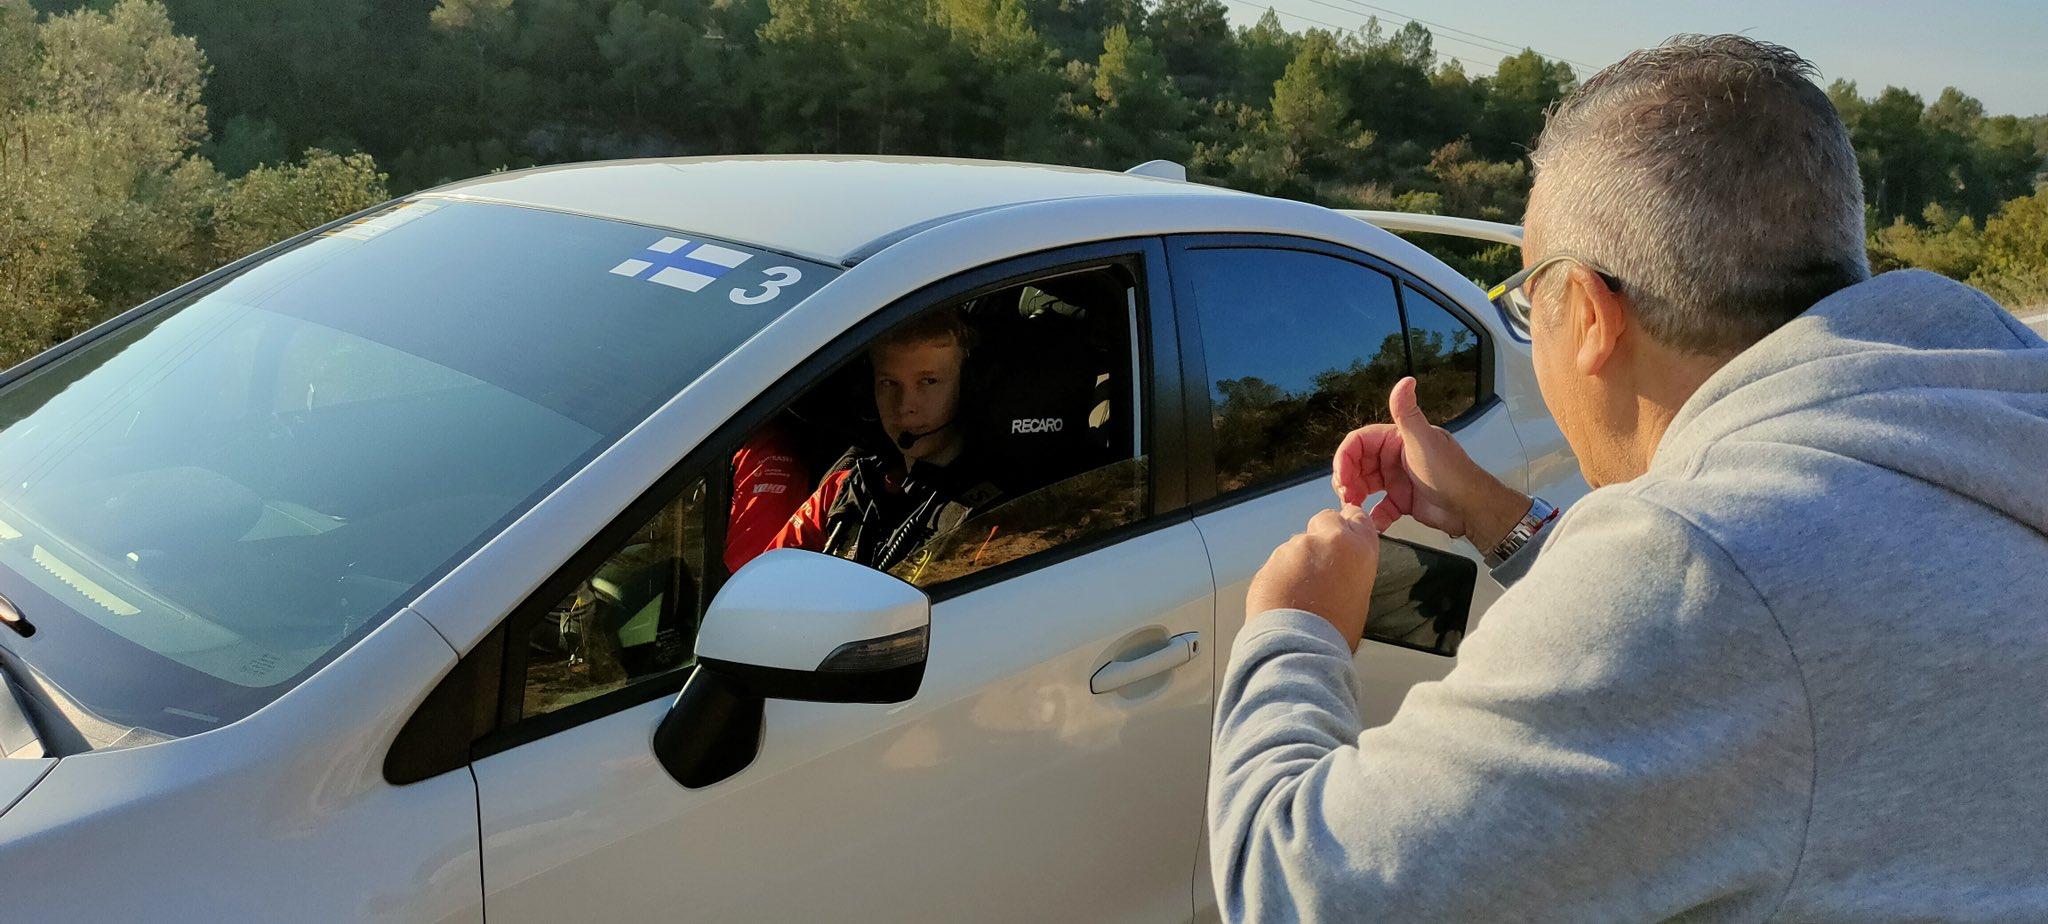 WRC: 56º RallyRACC Catalunya Costa Daurada - Rally de España [14-17 Octubre] - Página 2 FBfmxR6XEAUxS7w?format=jpg&name=large